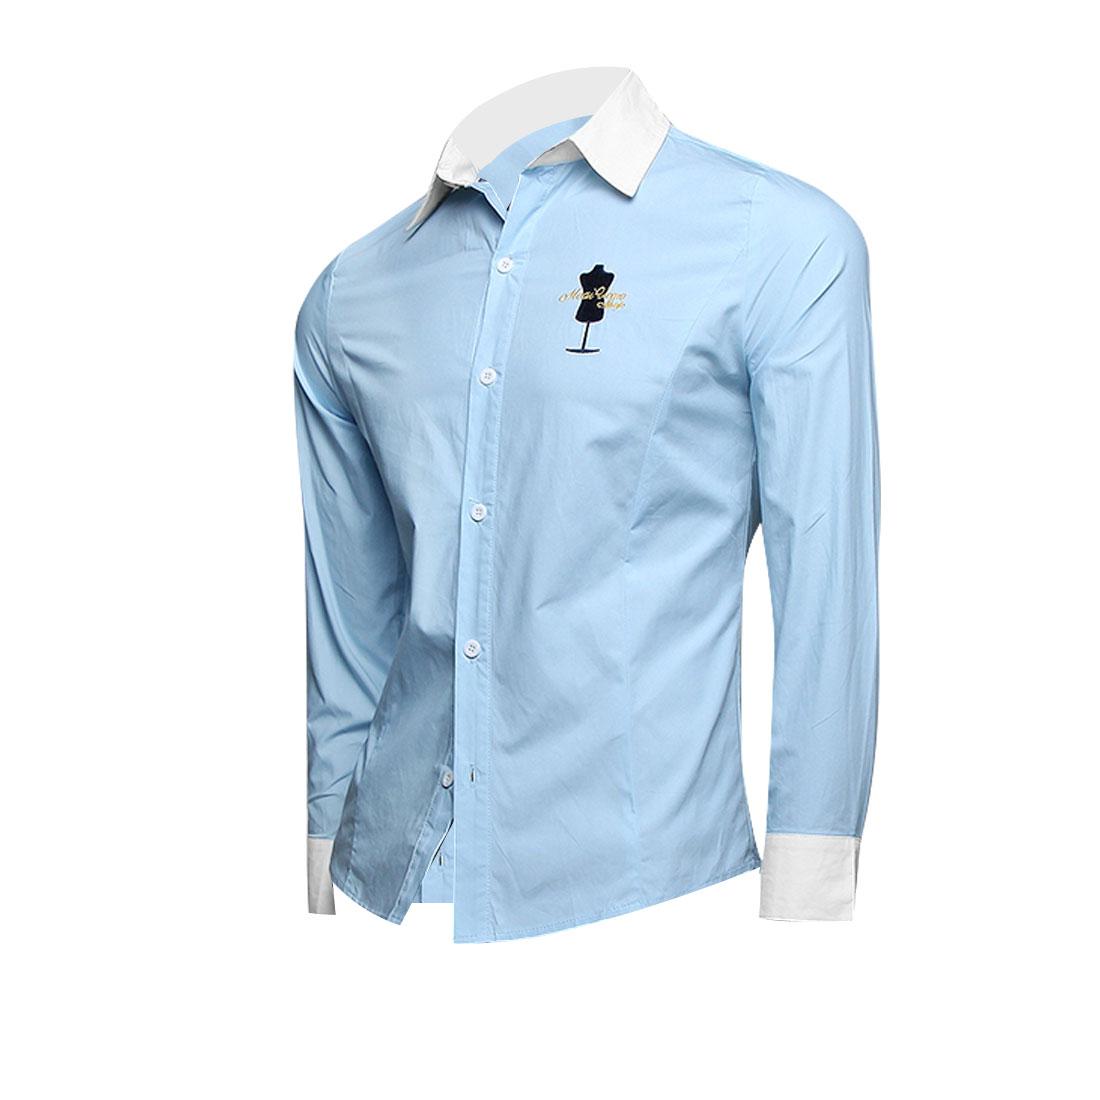 Men Button Front Long Sleeve Splice Shirt Light Blue White M